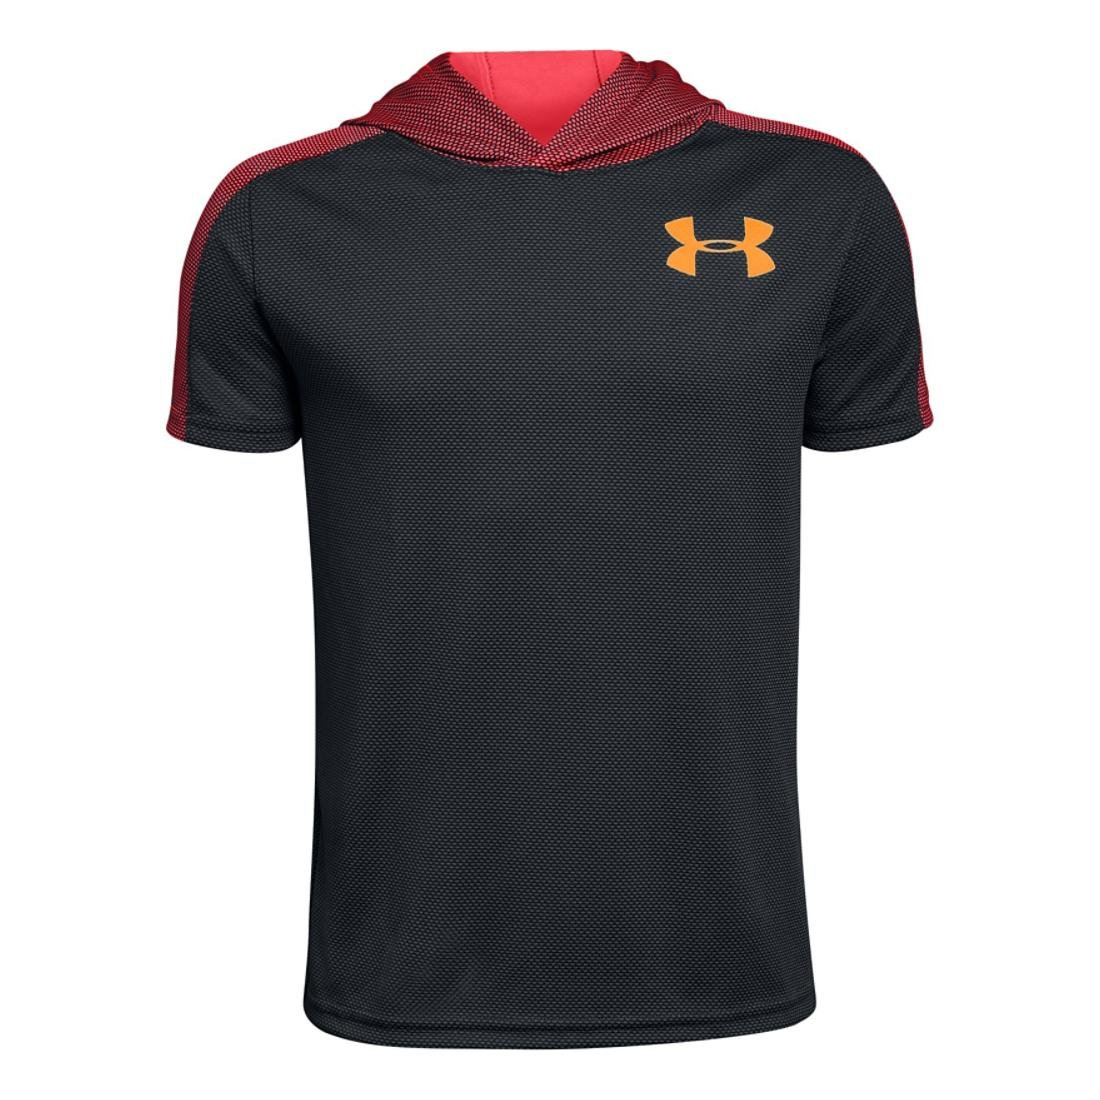 Under Armour Boys Textured Tech Short Sleeve Hood, Grey/Coral/Orange, YS by Under Armour